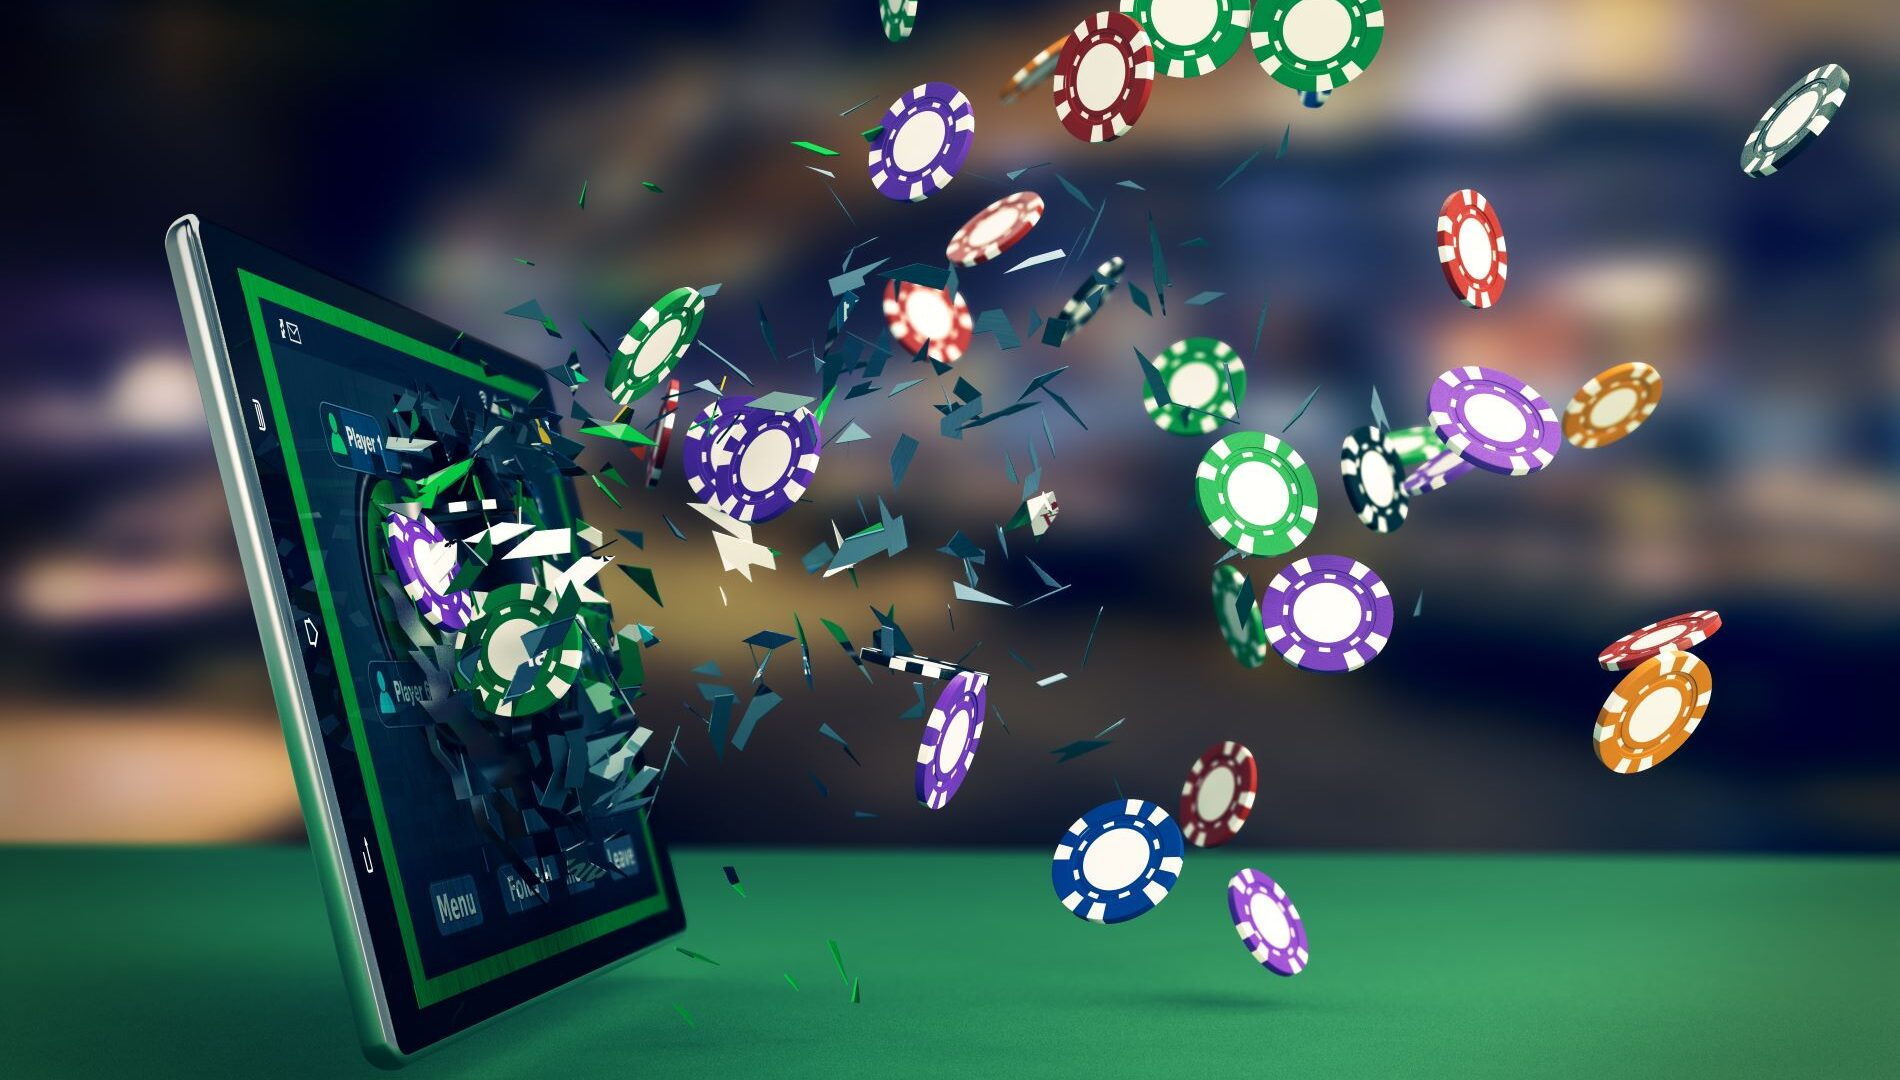 Casino online e gioco responsabile